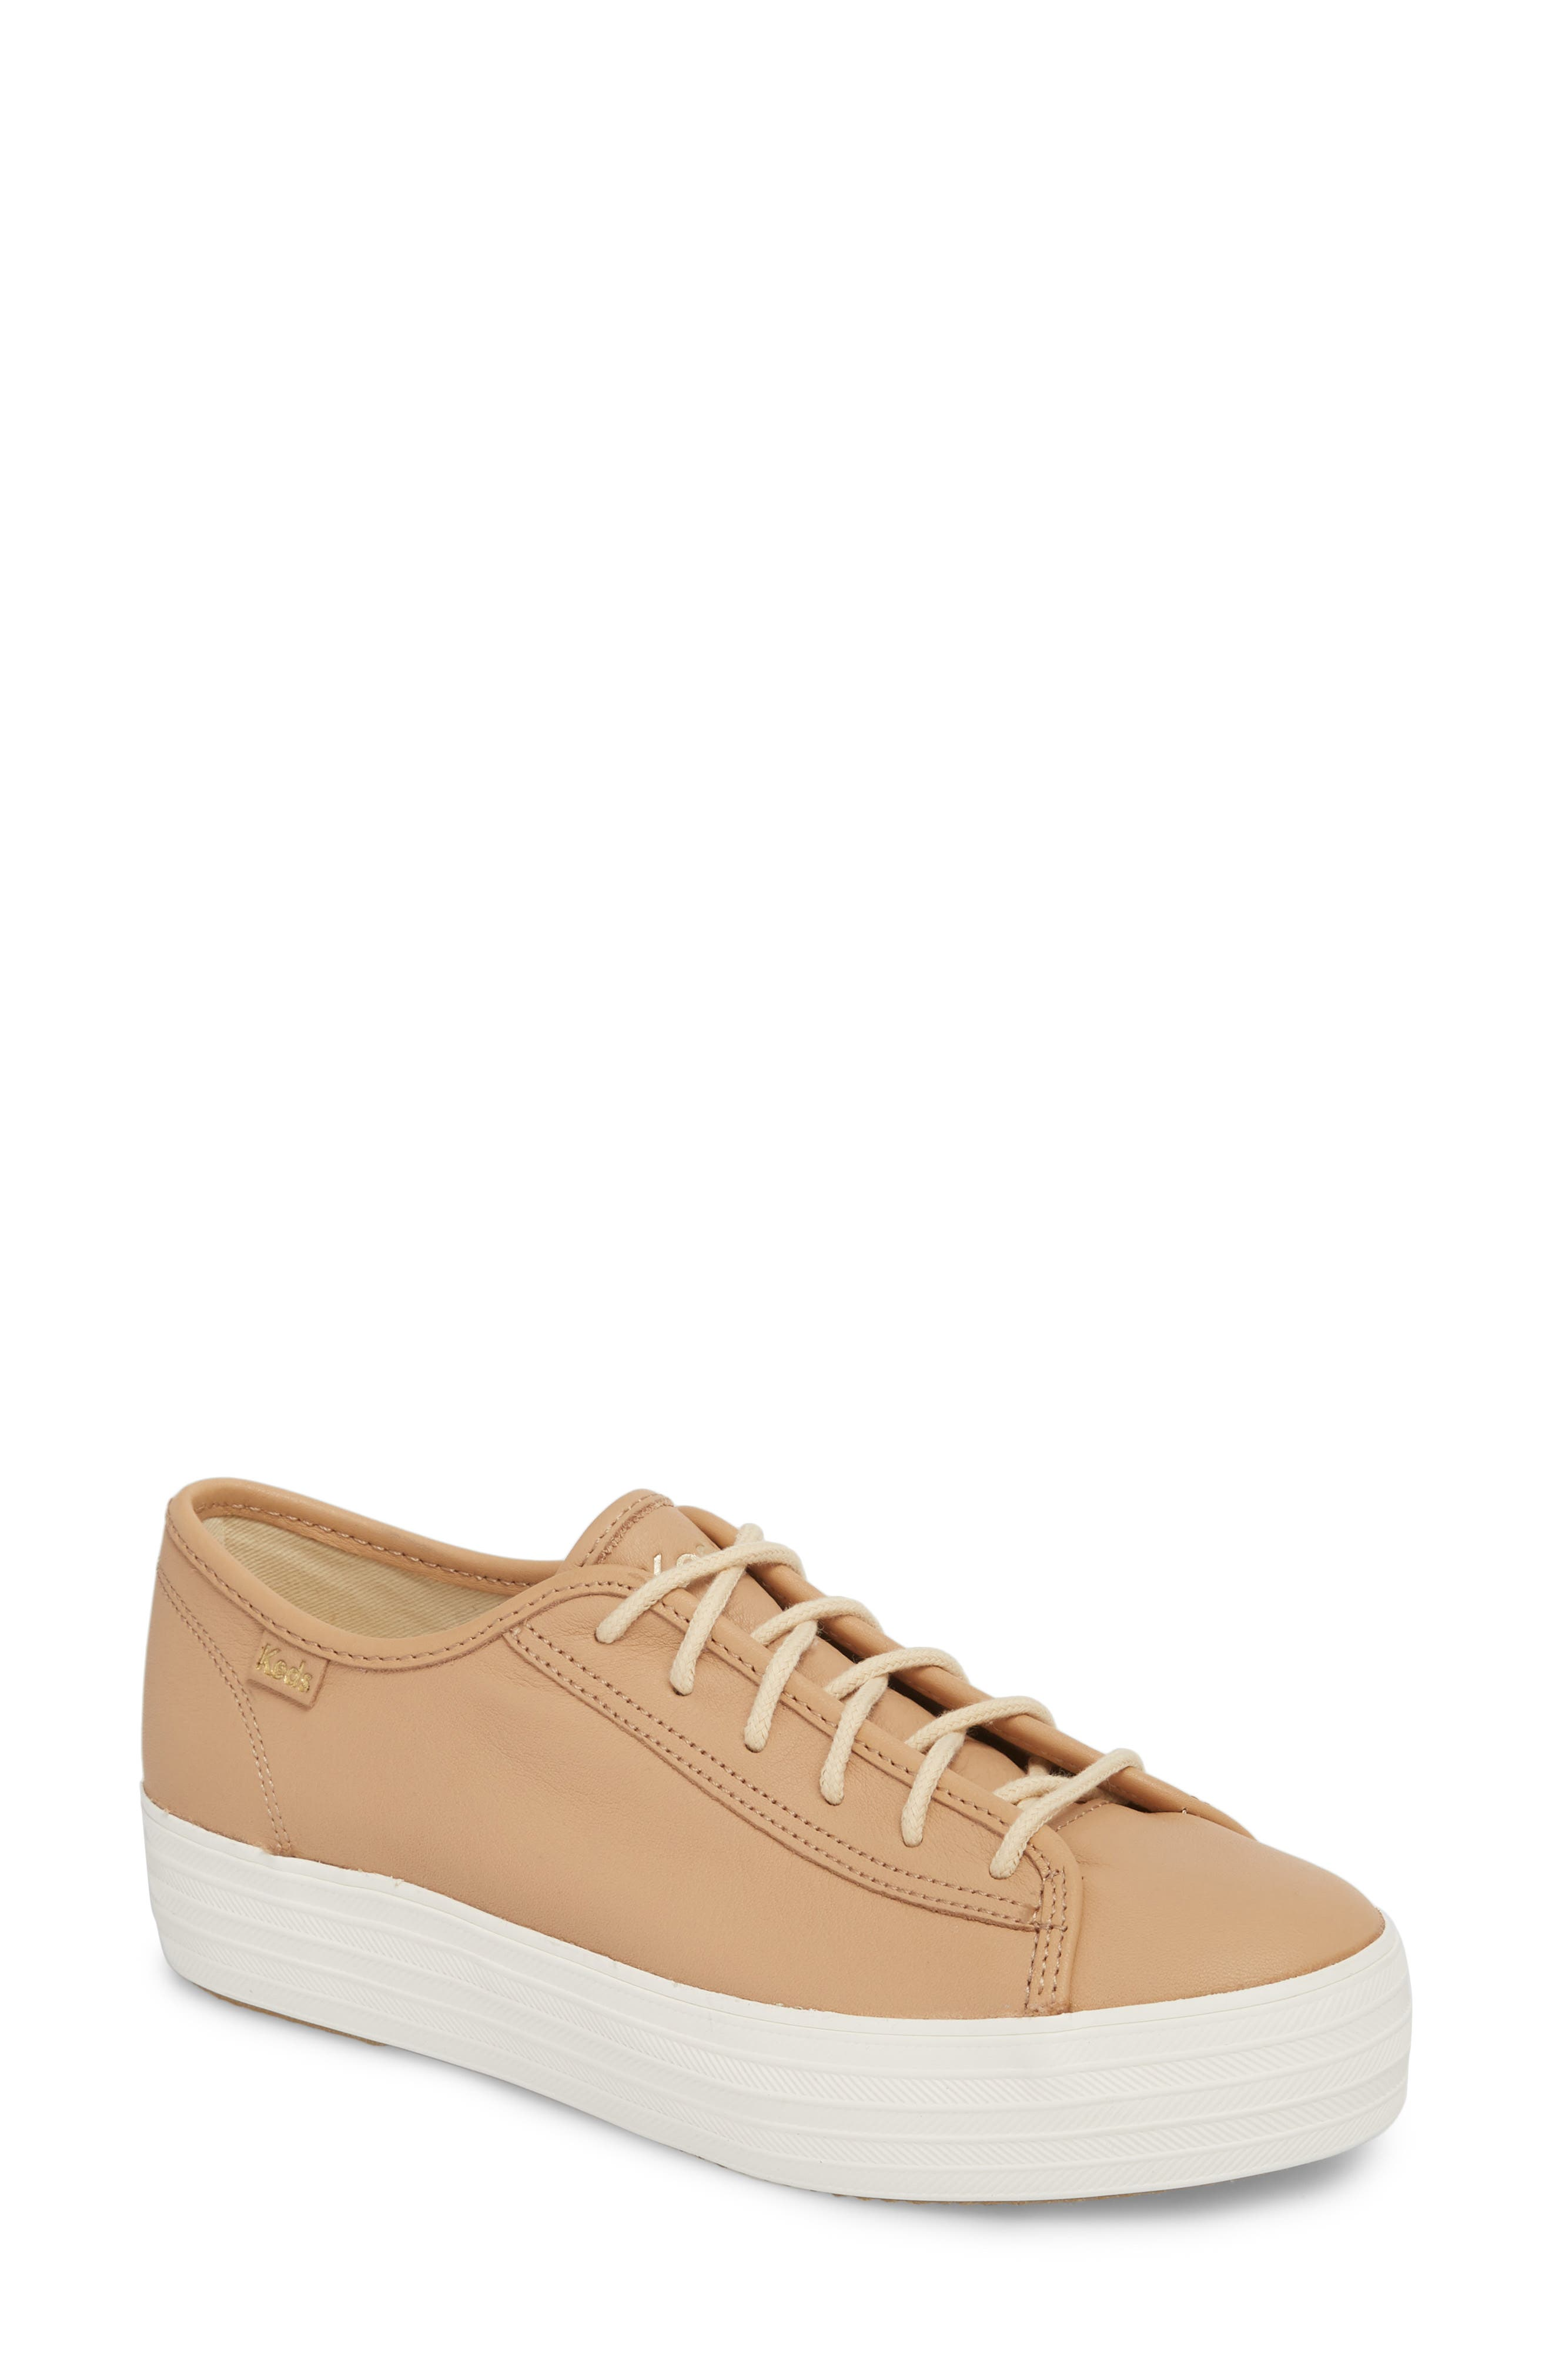 Triple Kick Platform Sneaker,                         Main,                         color, 200